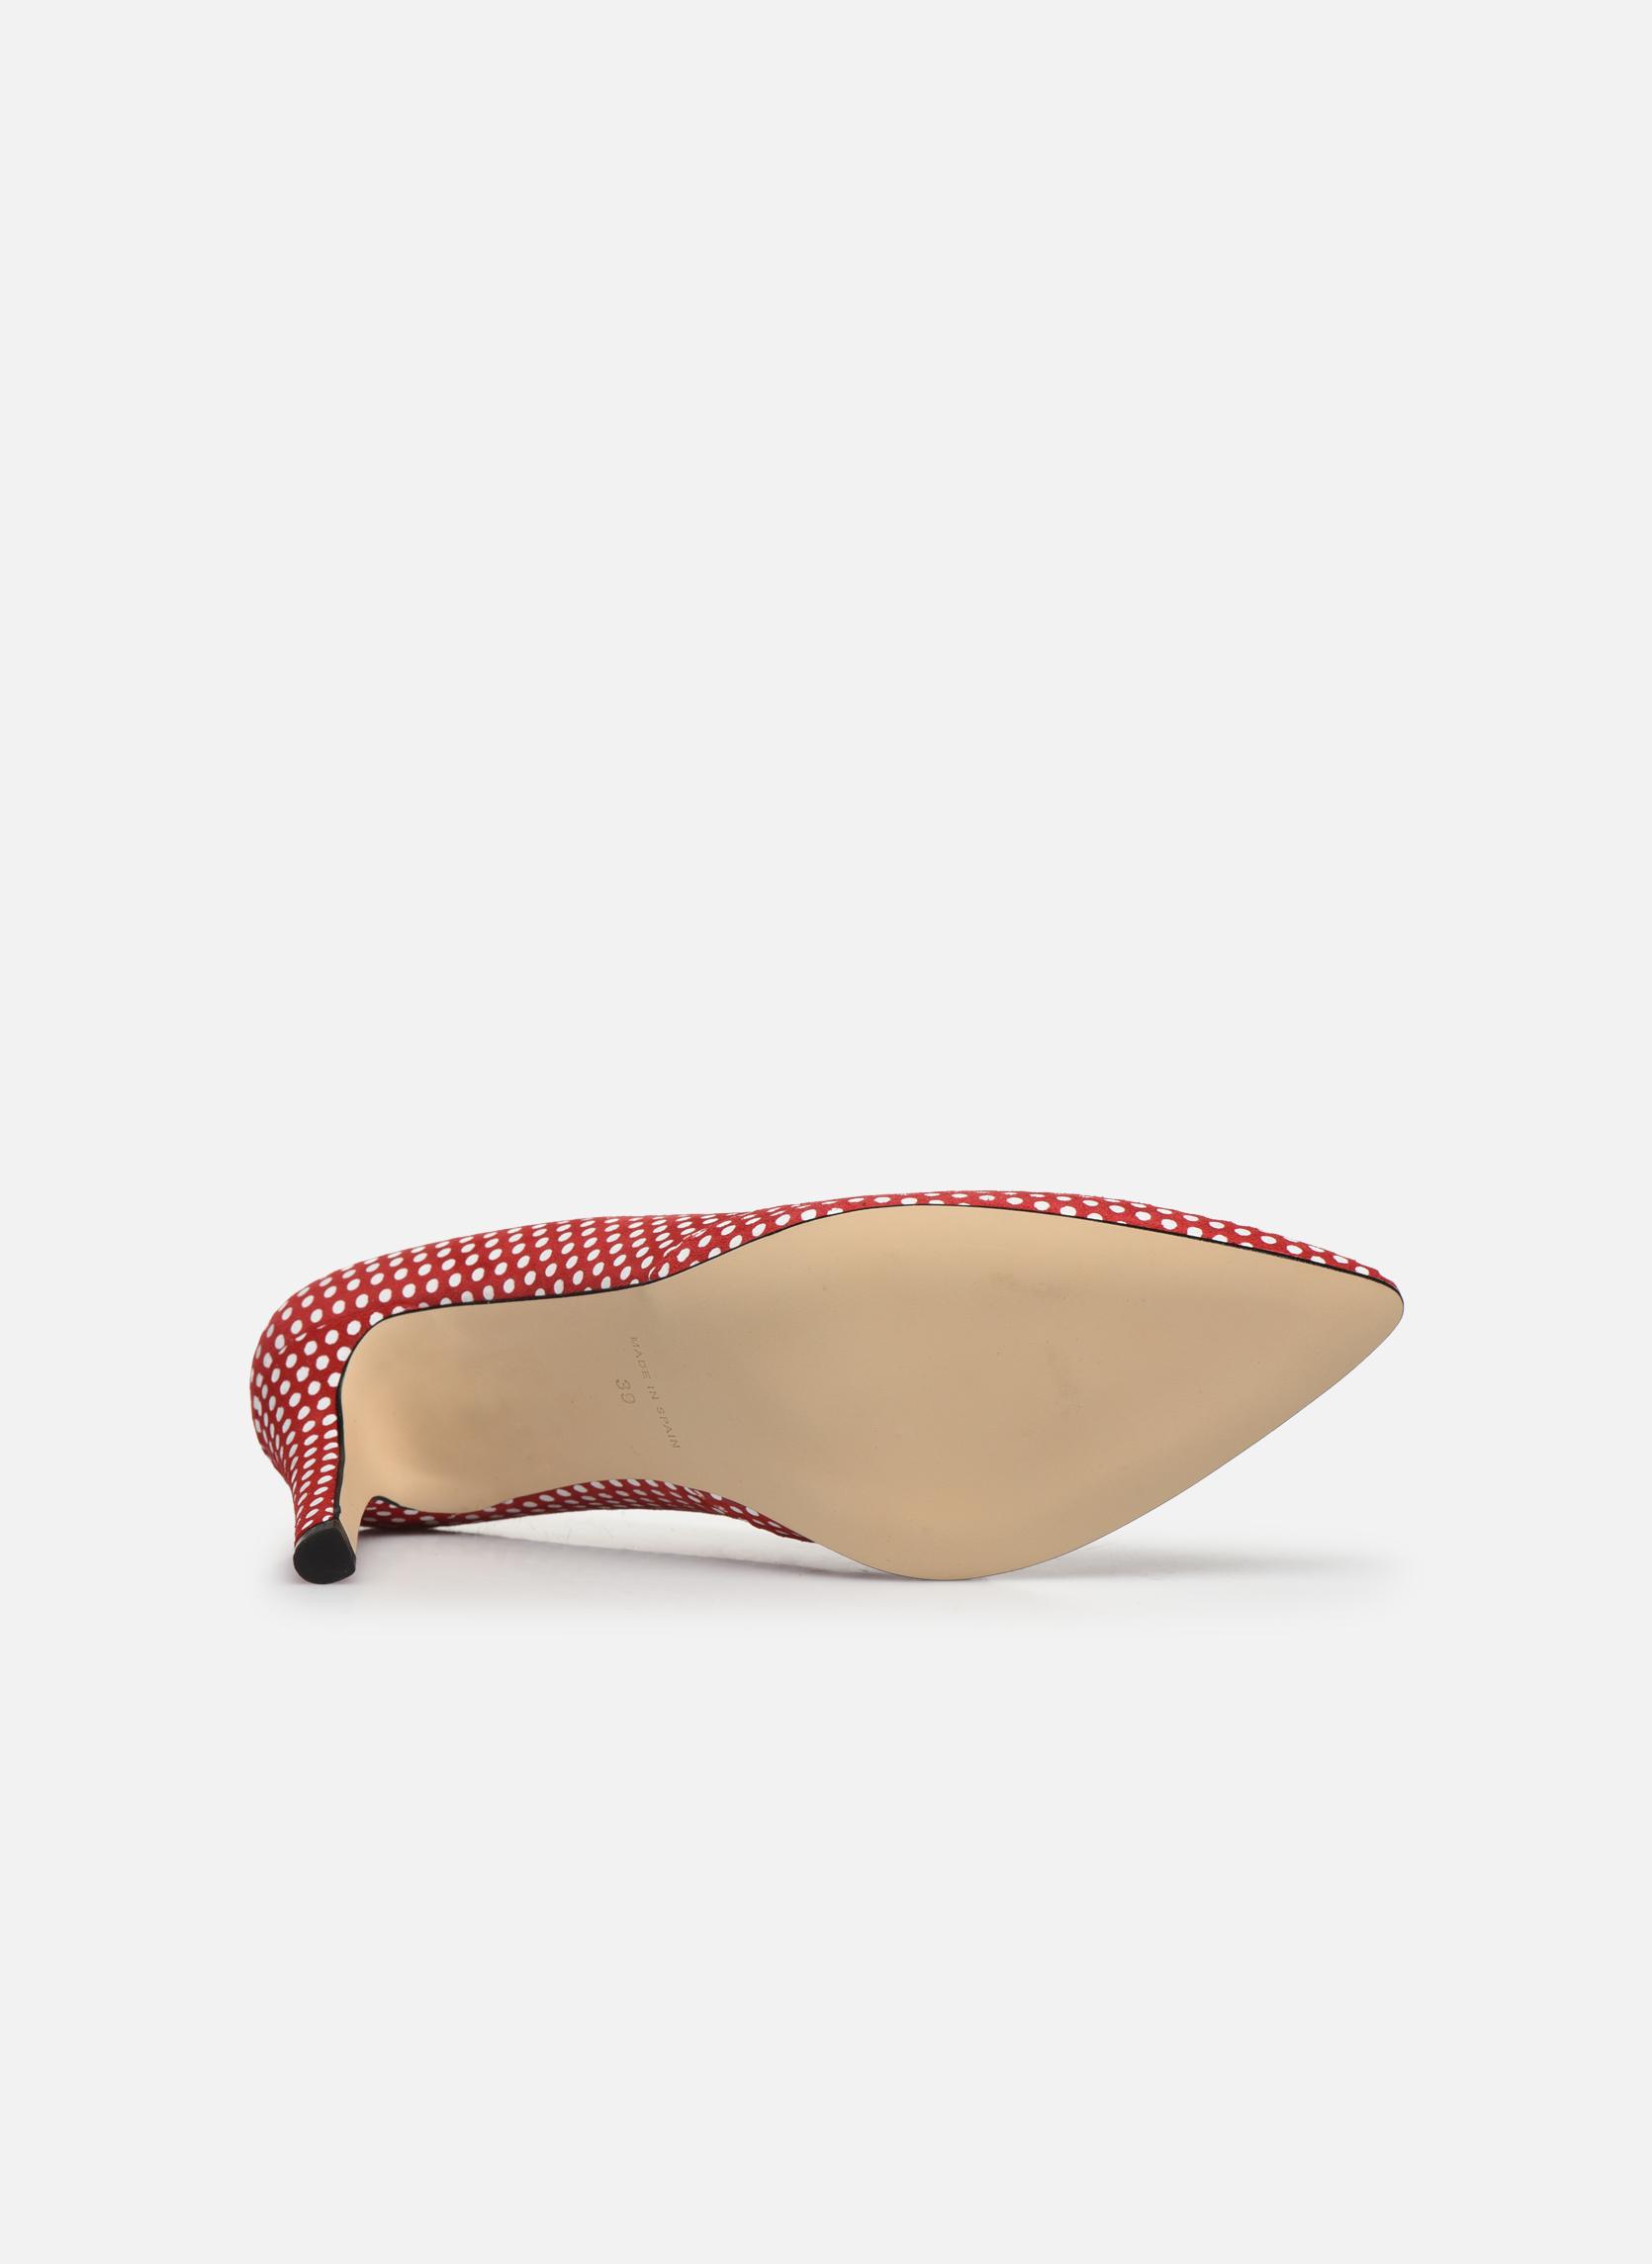 Fifillotte velours pois rouge